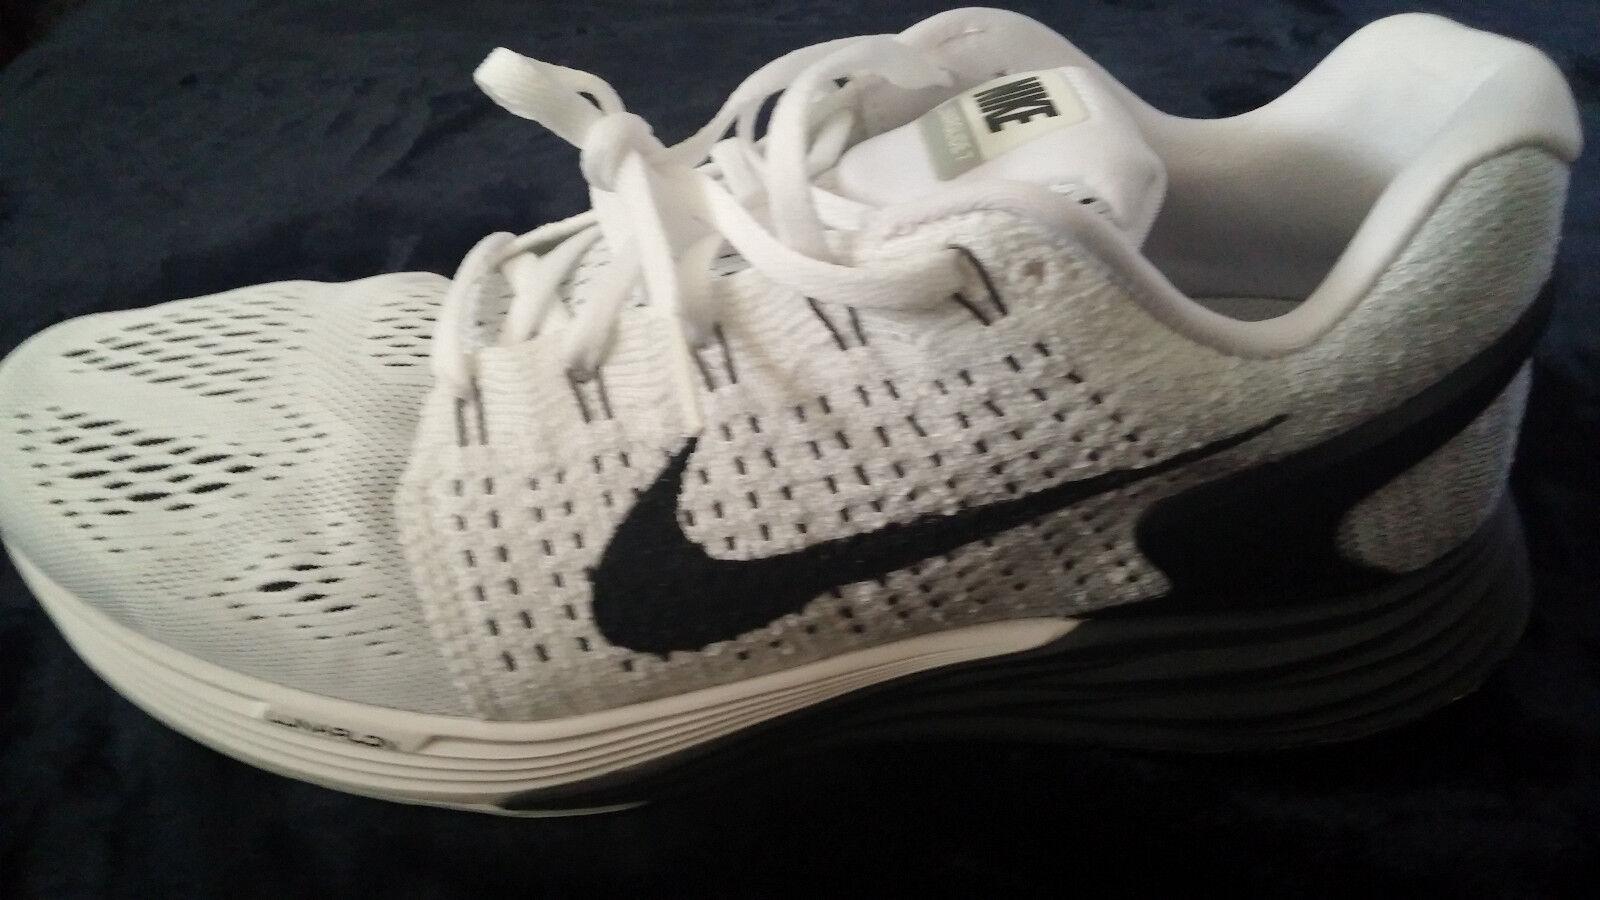 NIKE Lunarglide  Mens Running Shoes  White / Black Size  8.5